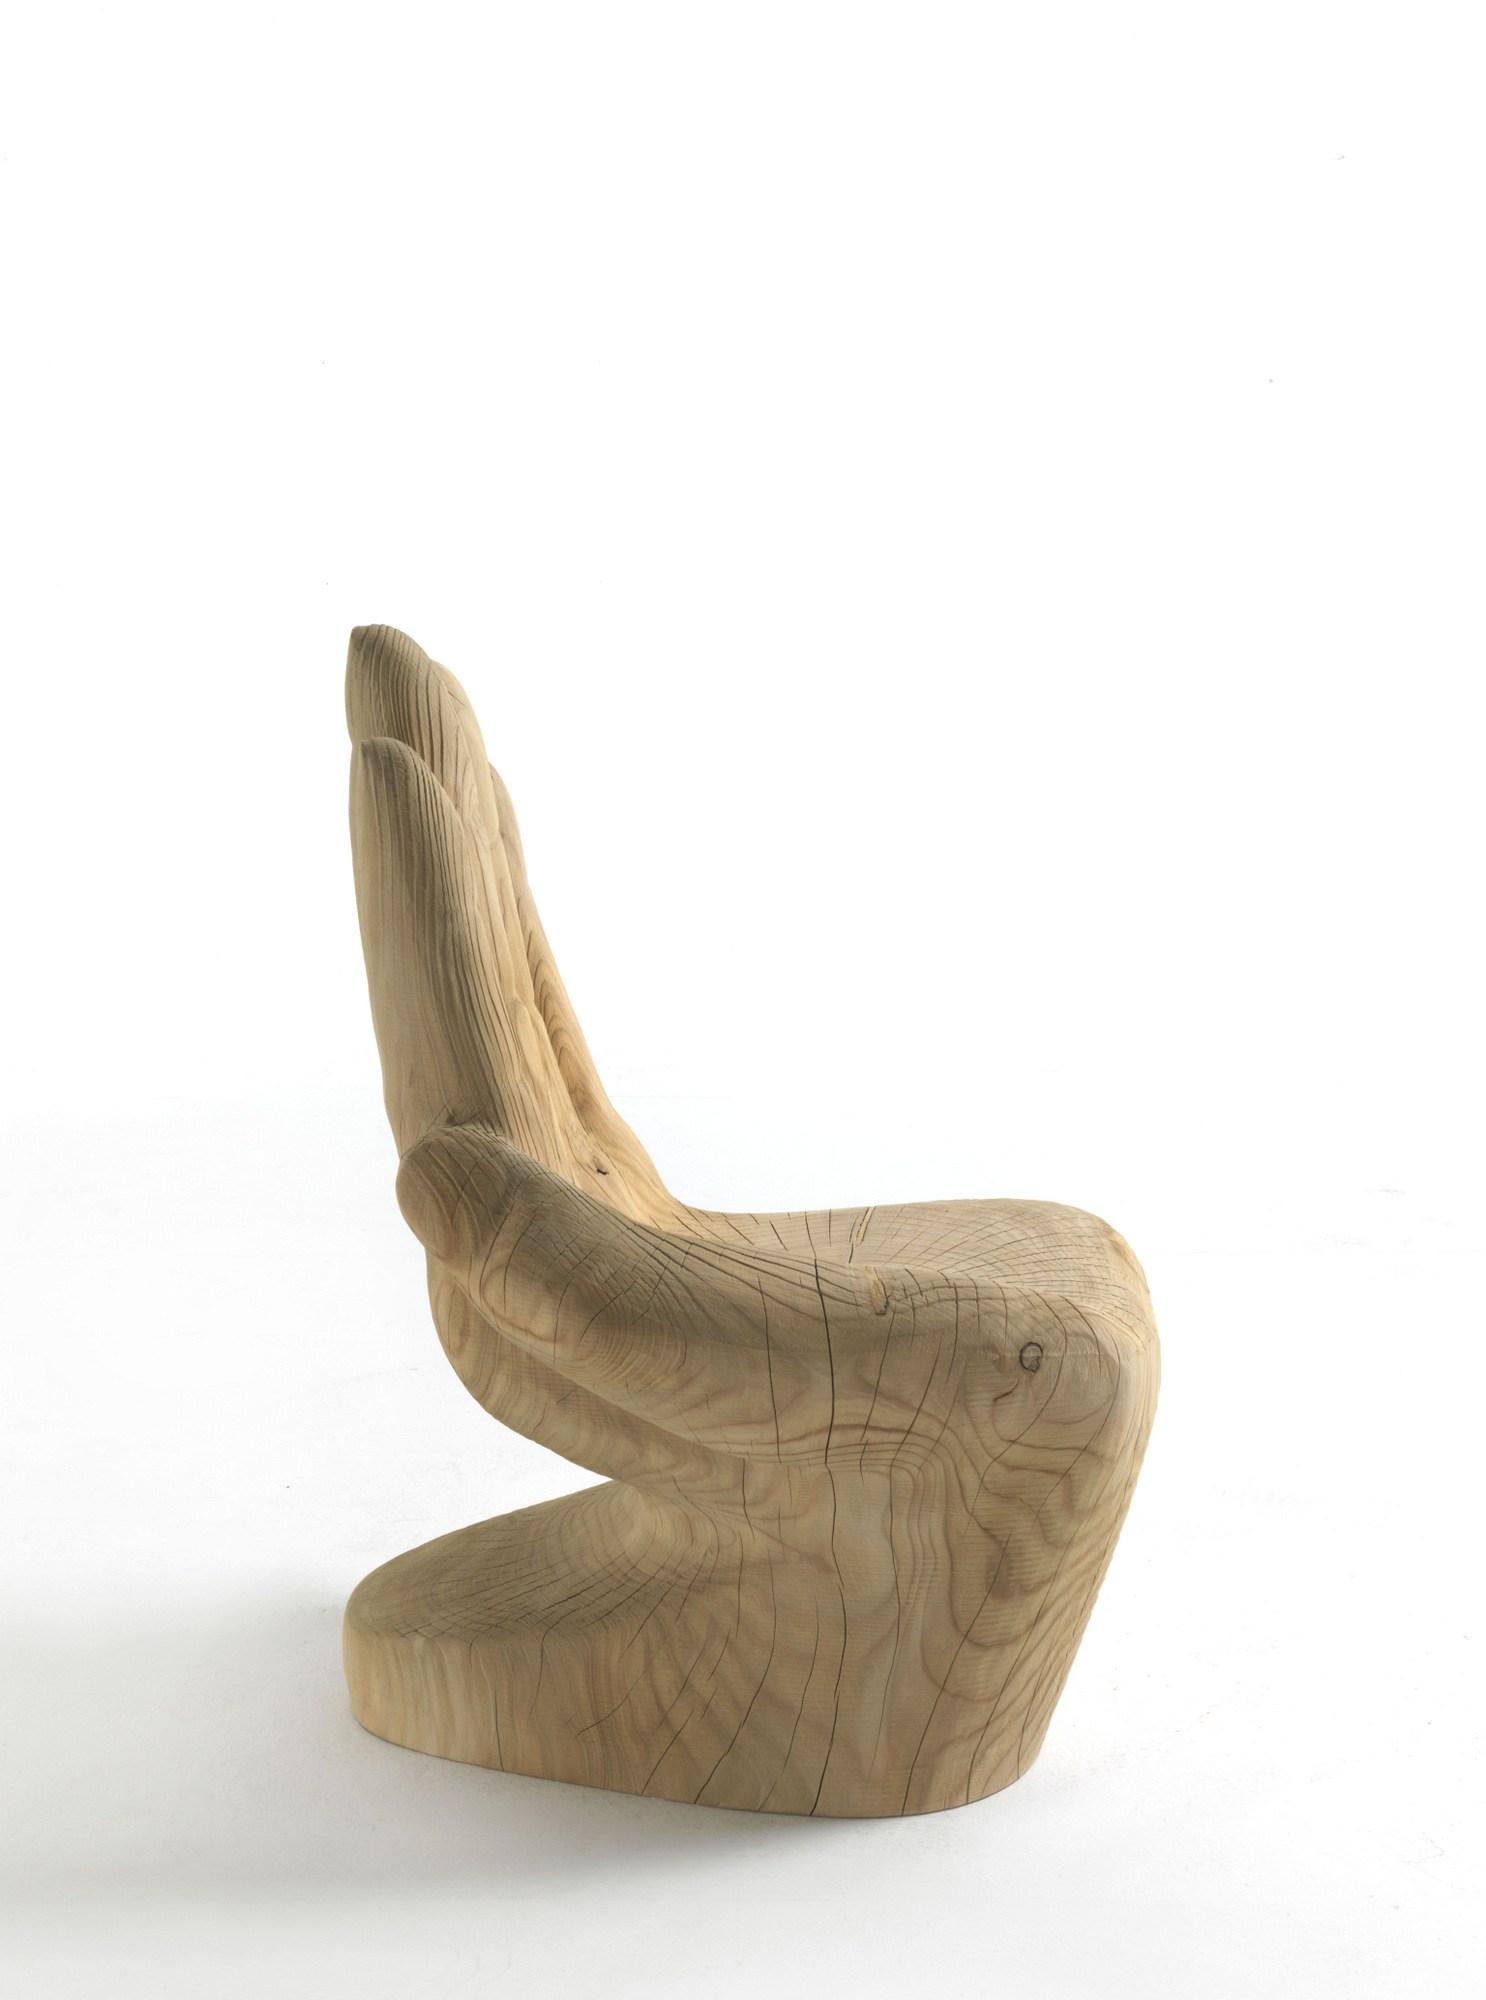 Handy Armchair by Antonella Scarpitta for Riva 1920